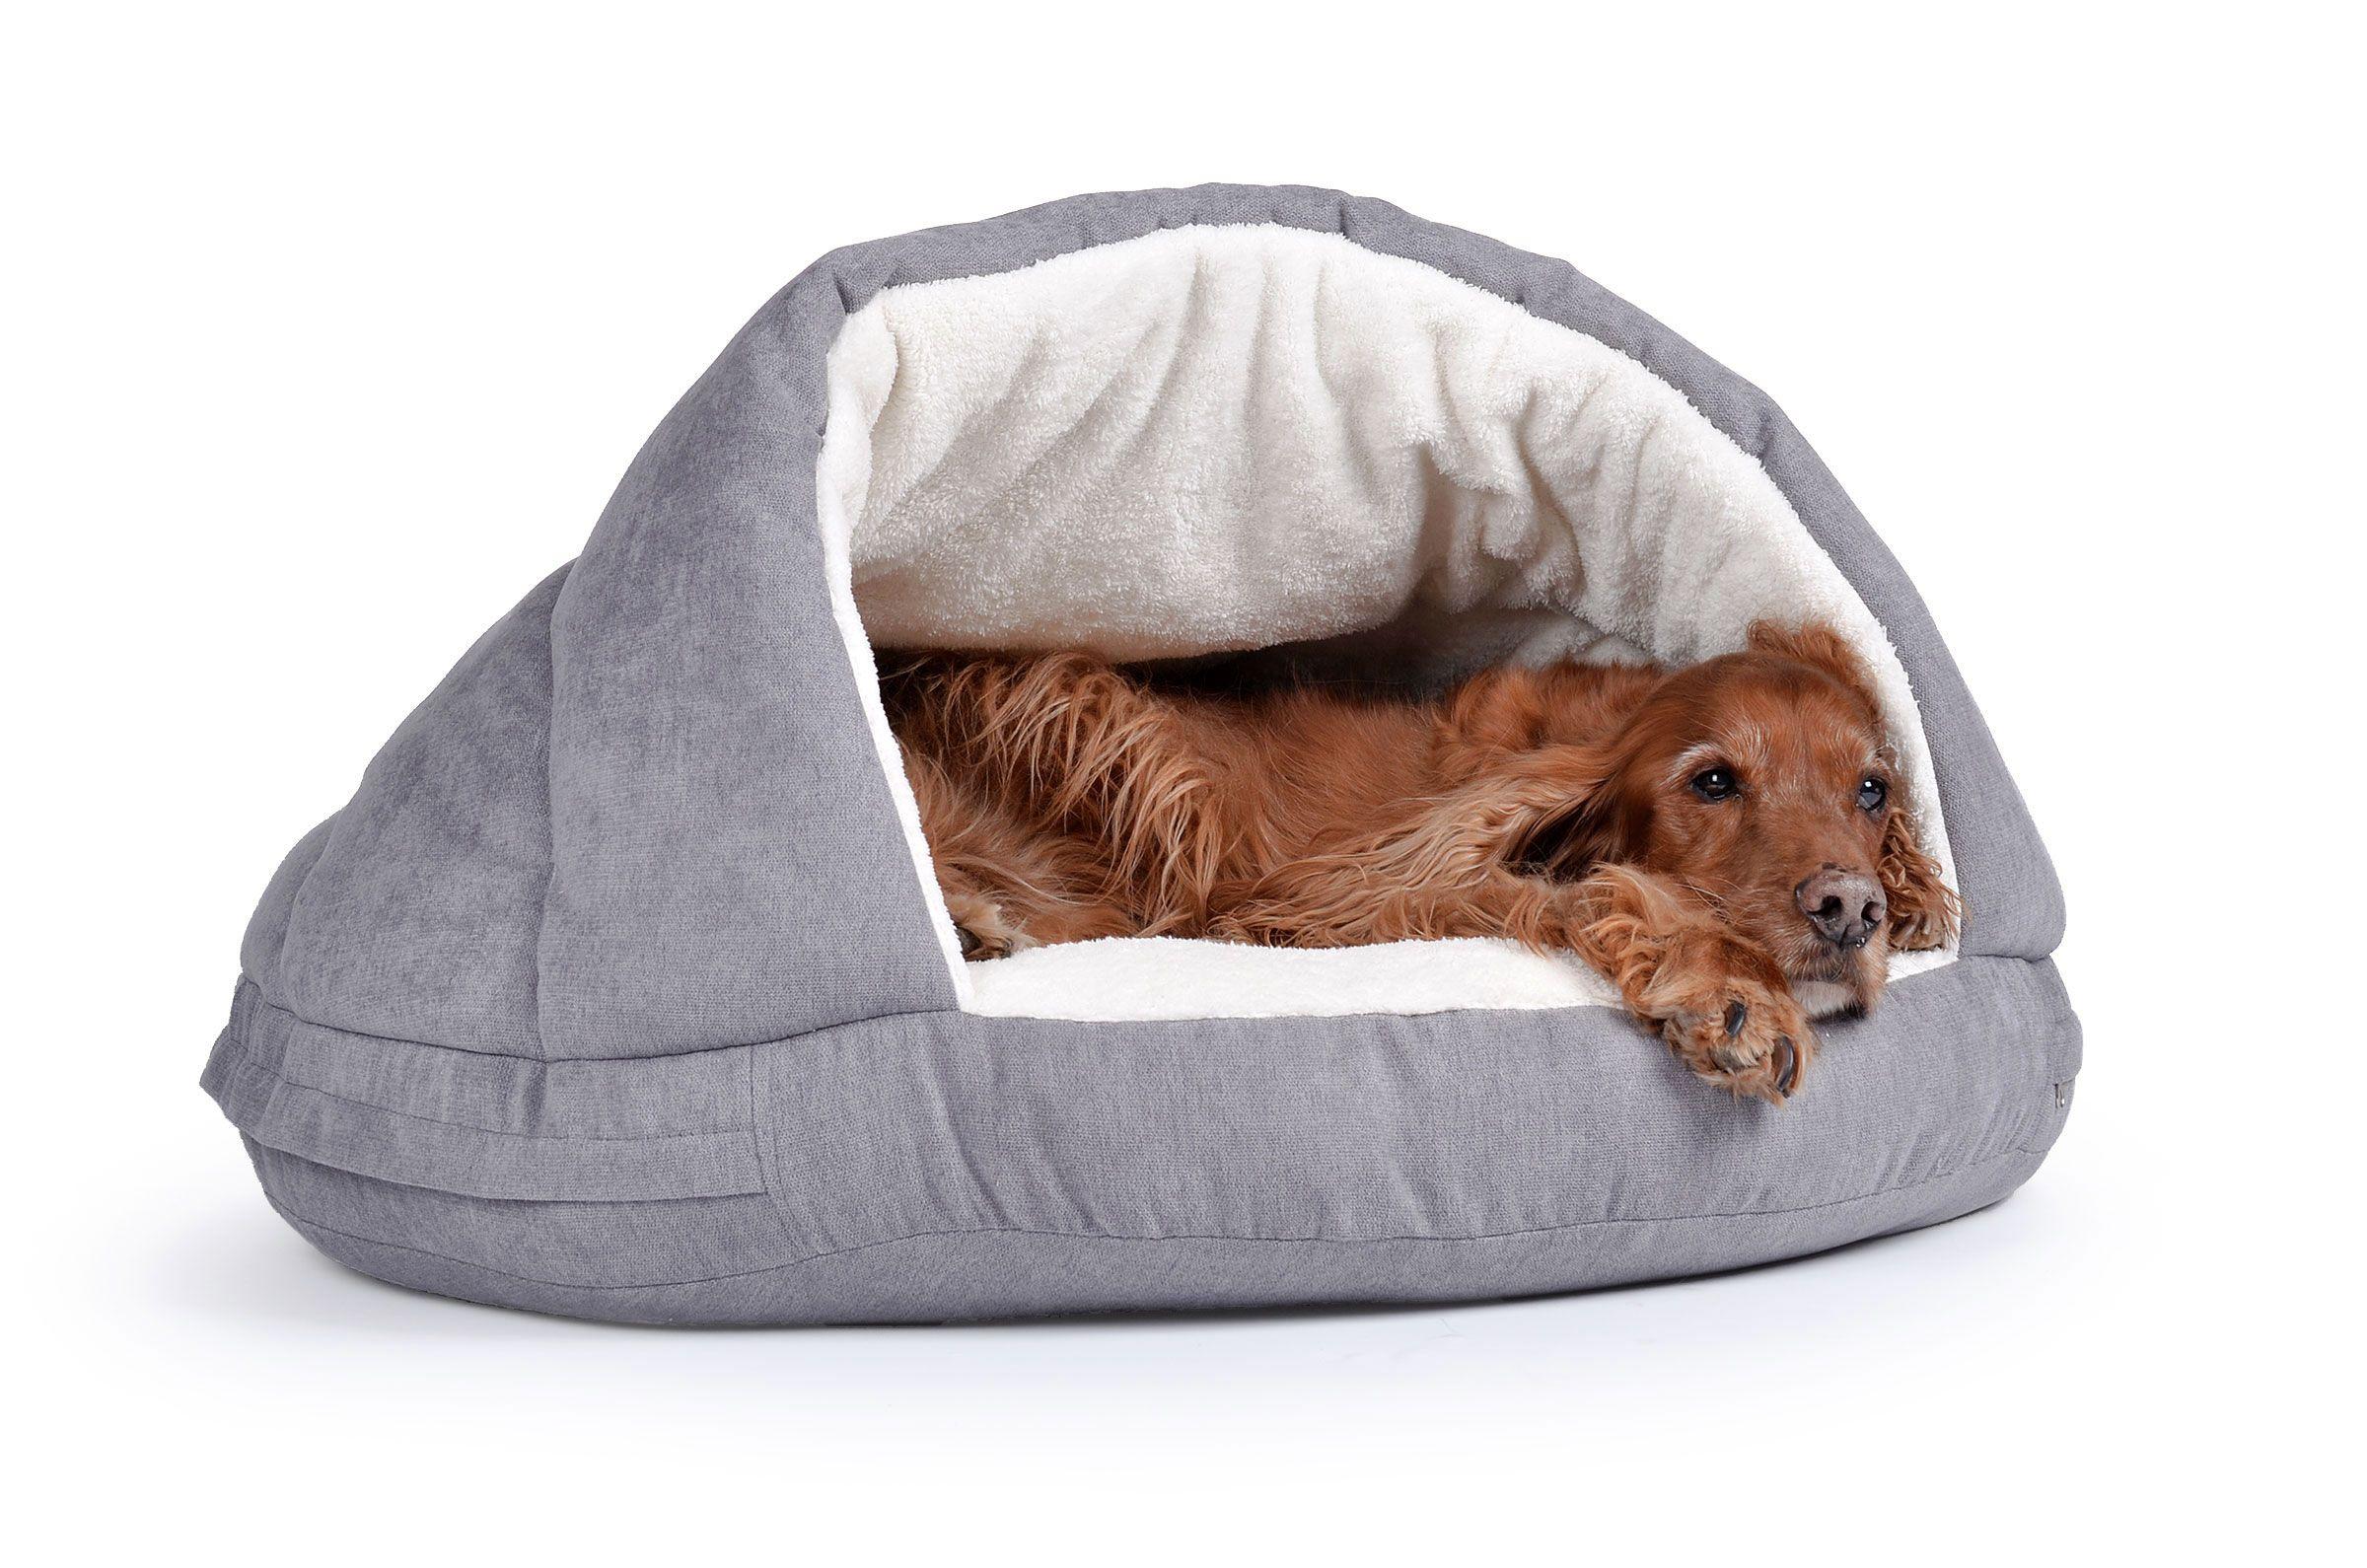 hundeh hle hundebett kuschelh hle f r hunde shell dogbed. Black Bedroom Furniture Sets. Home Design Ideas